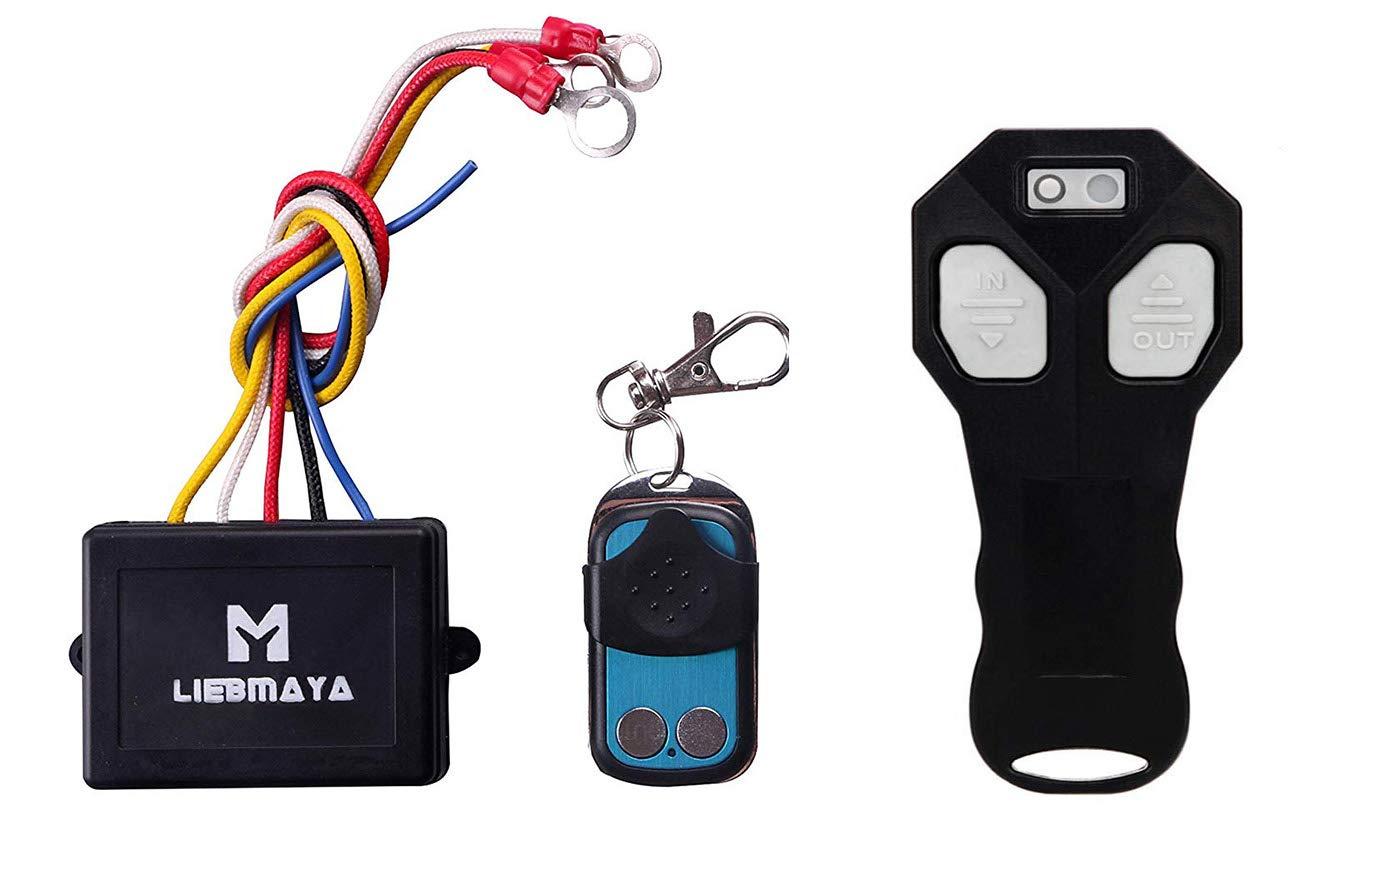 LIEBMAYA Wireless Winch Remote Control Kit for Truck Jeep ATV SUV 12V Switch Handset Waterproof by LIEBMAYA